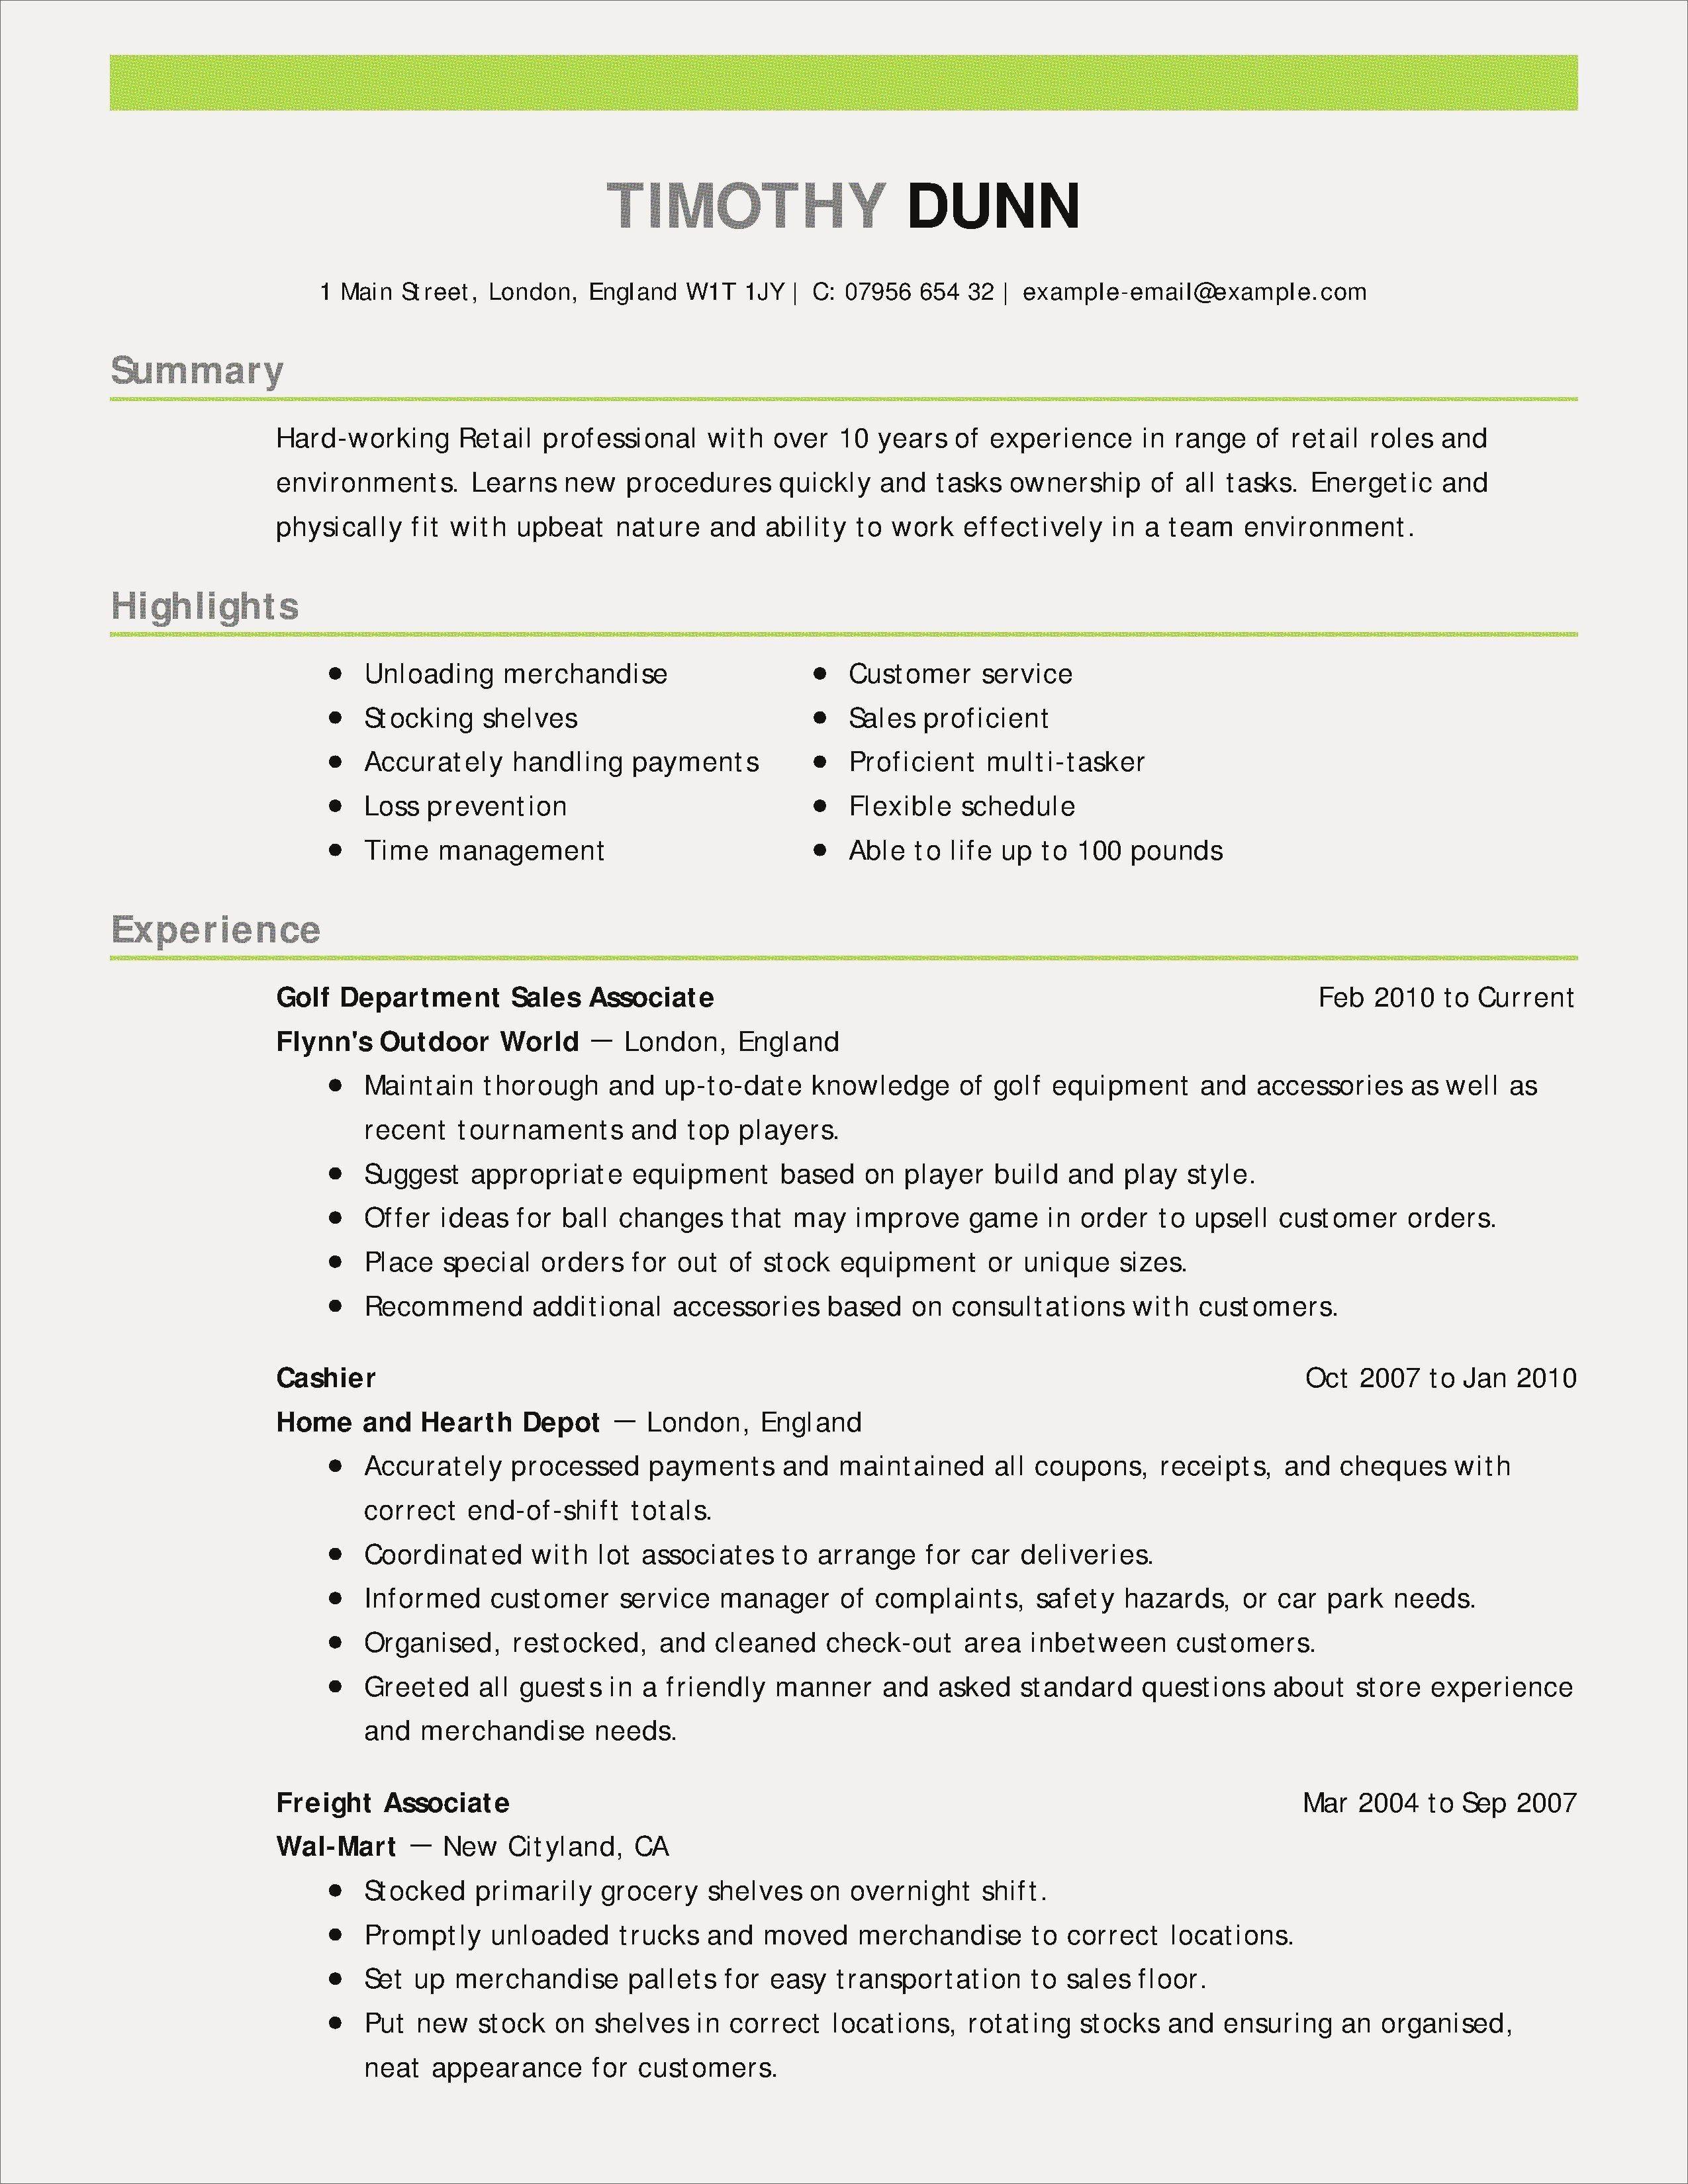 Resume For Restaurant Job Beautiful New Restaurant Worker Resume Resume Objective Examples Good Resume Examples Resume Skills